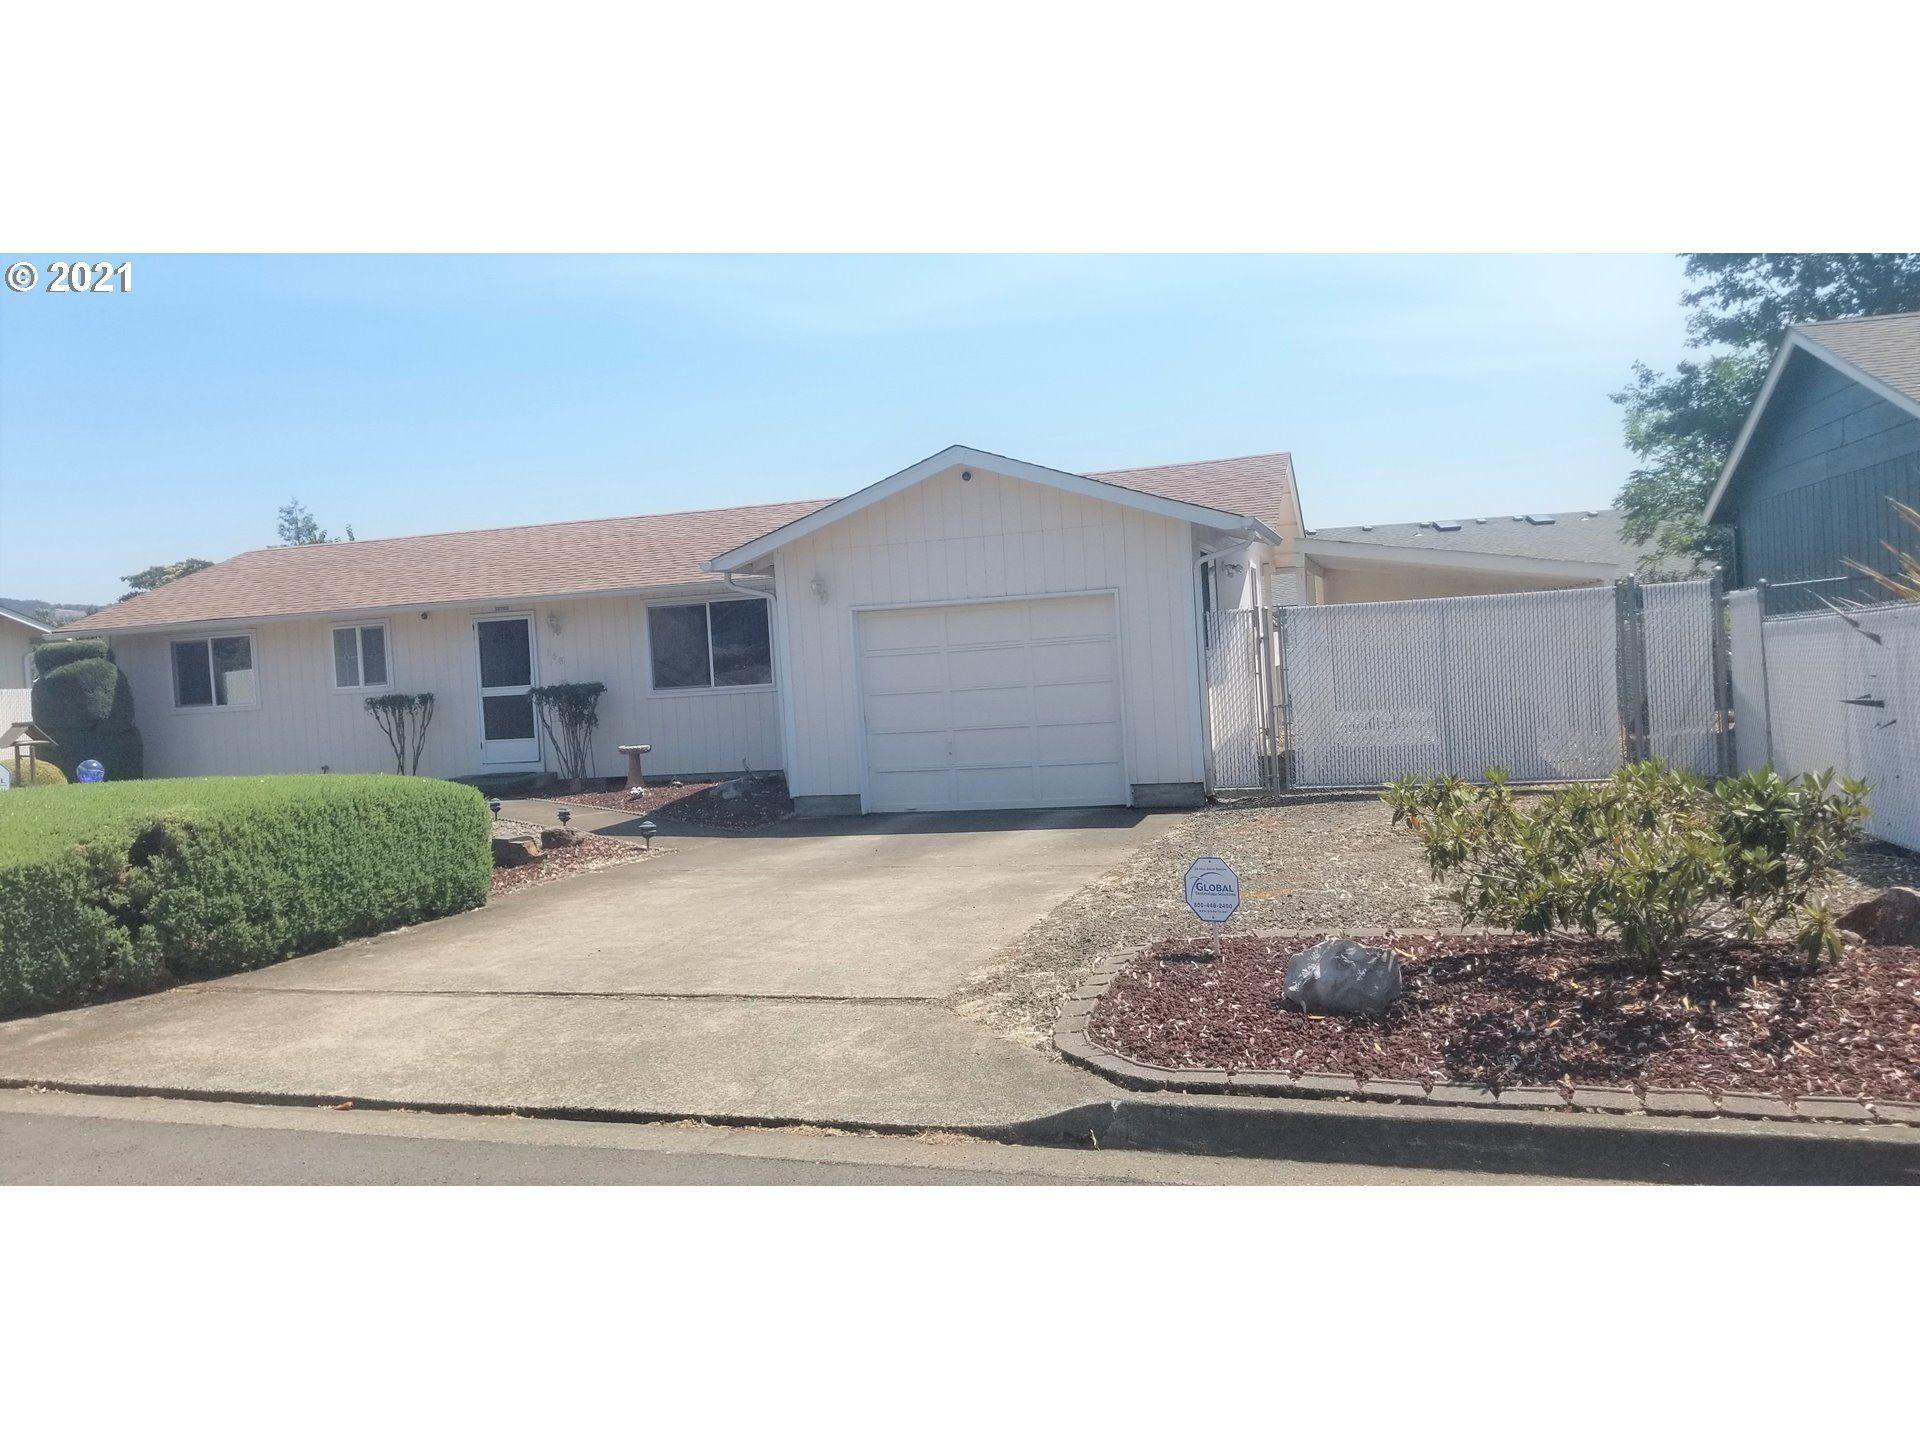 148 BELMONT CT, Roseburg, OR 97471 - MLS#: 21280150